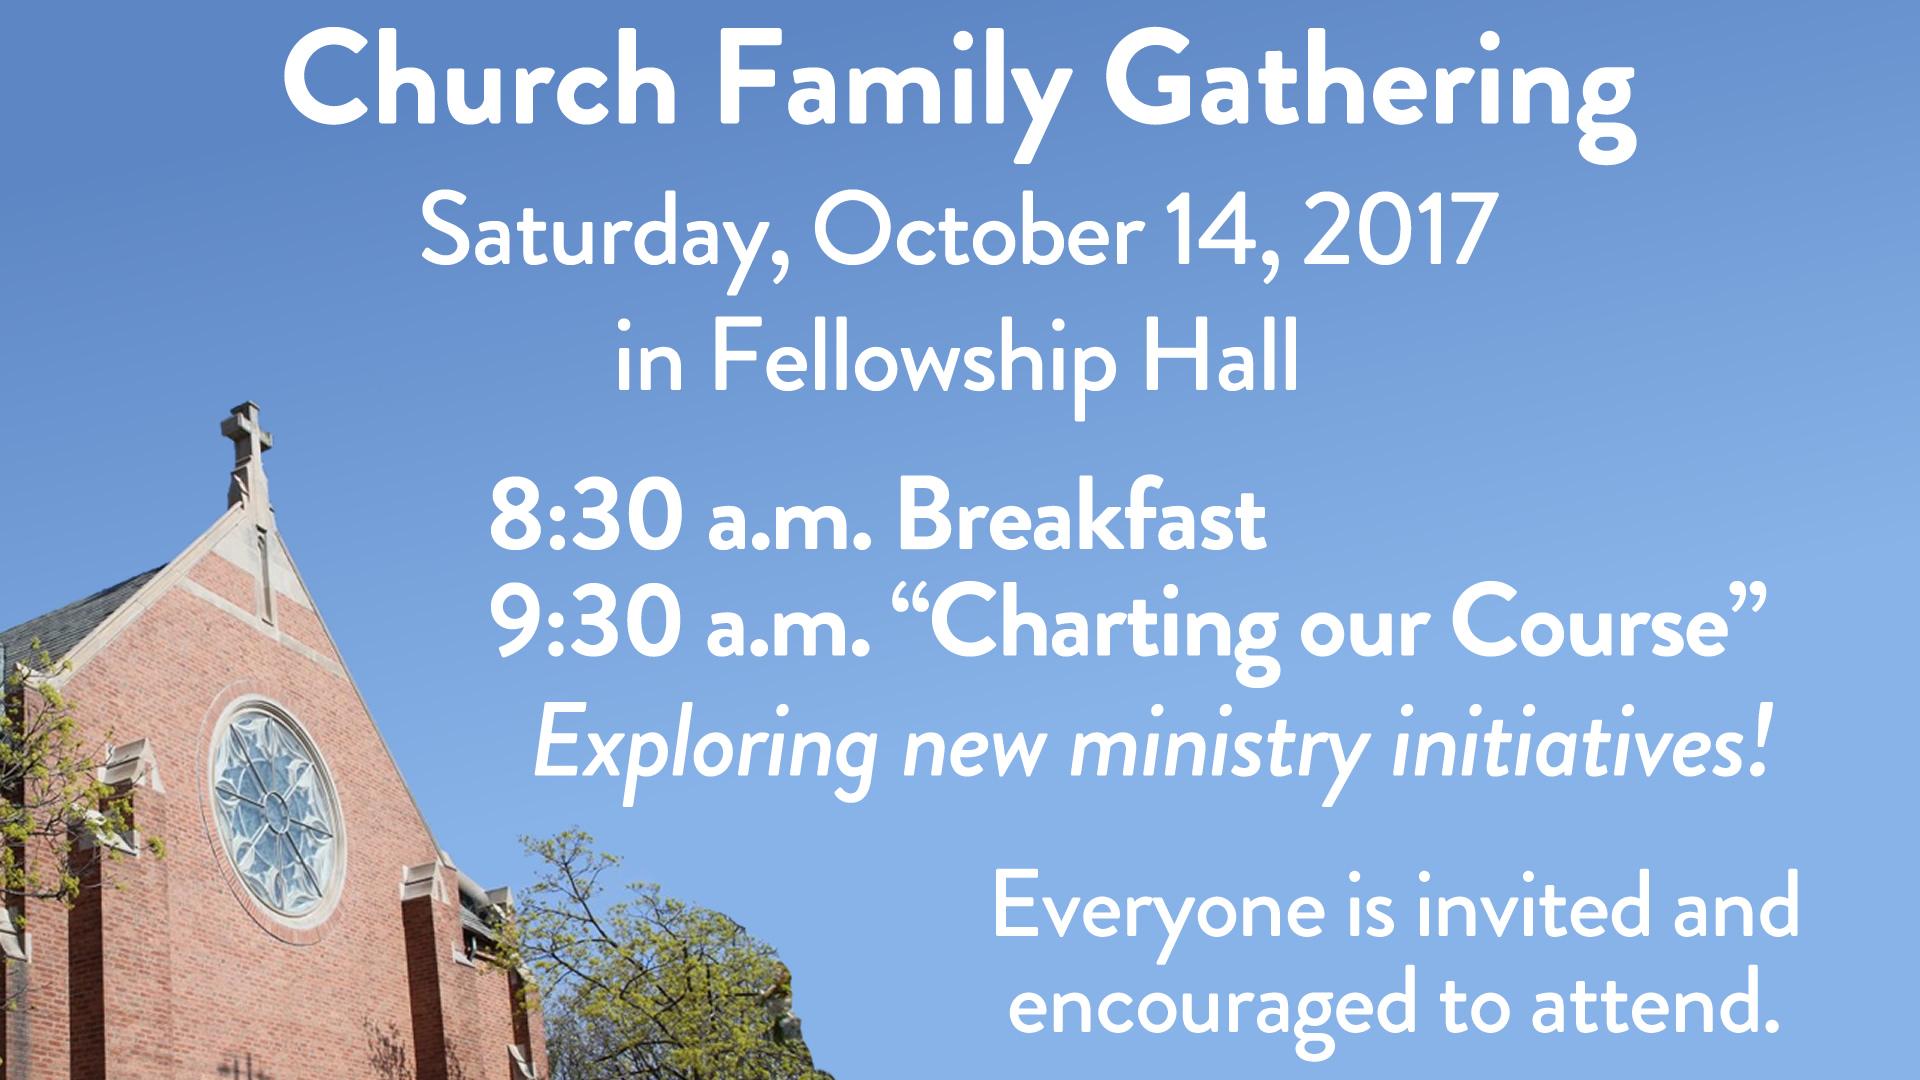 Church Family Gathering 2017.10.14.jpg